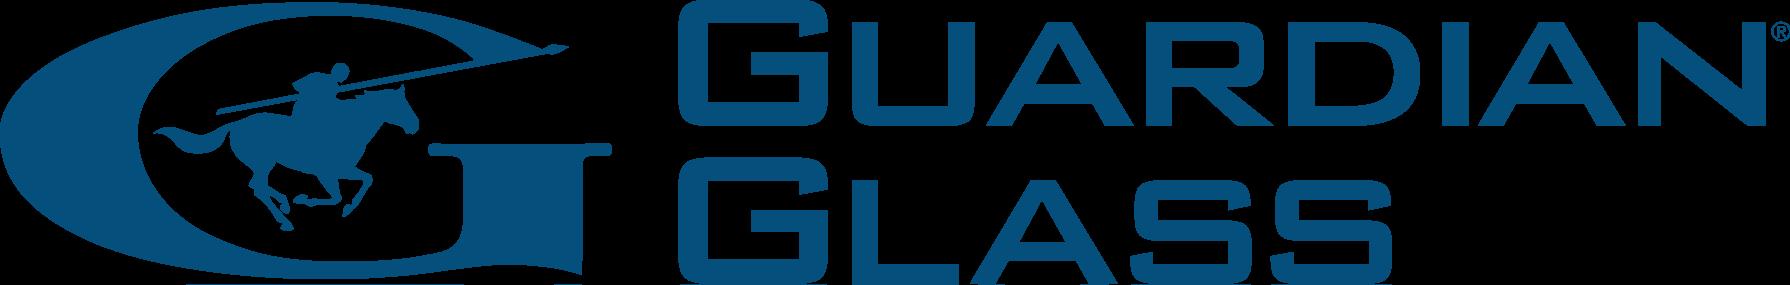 guardian-campaign-logo